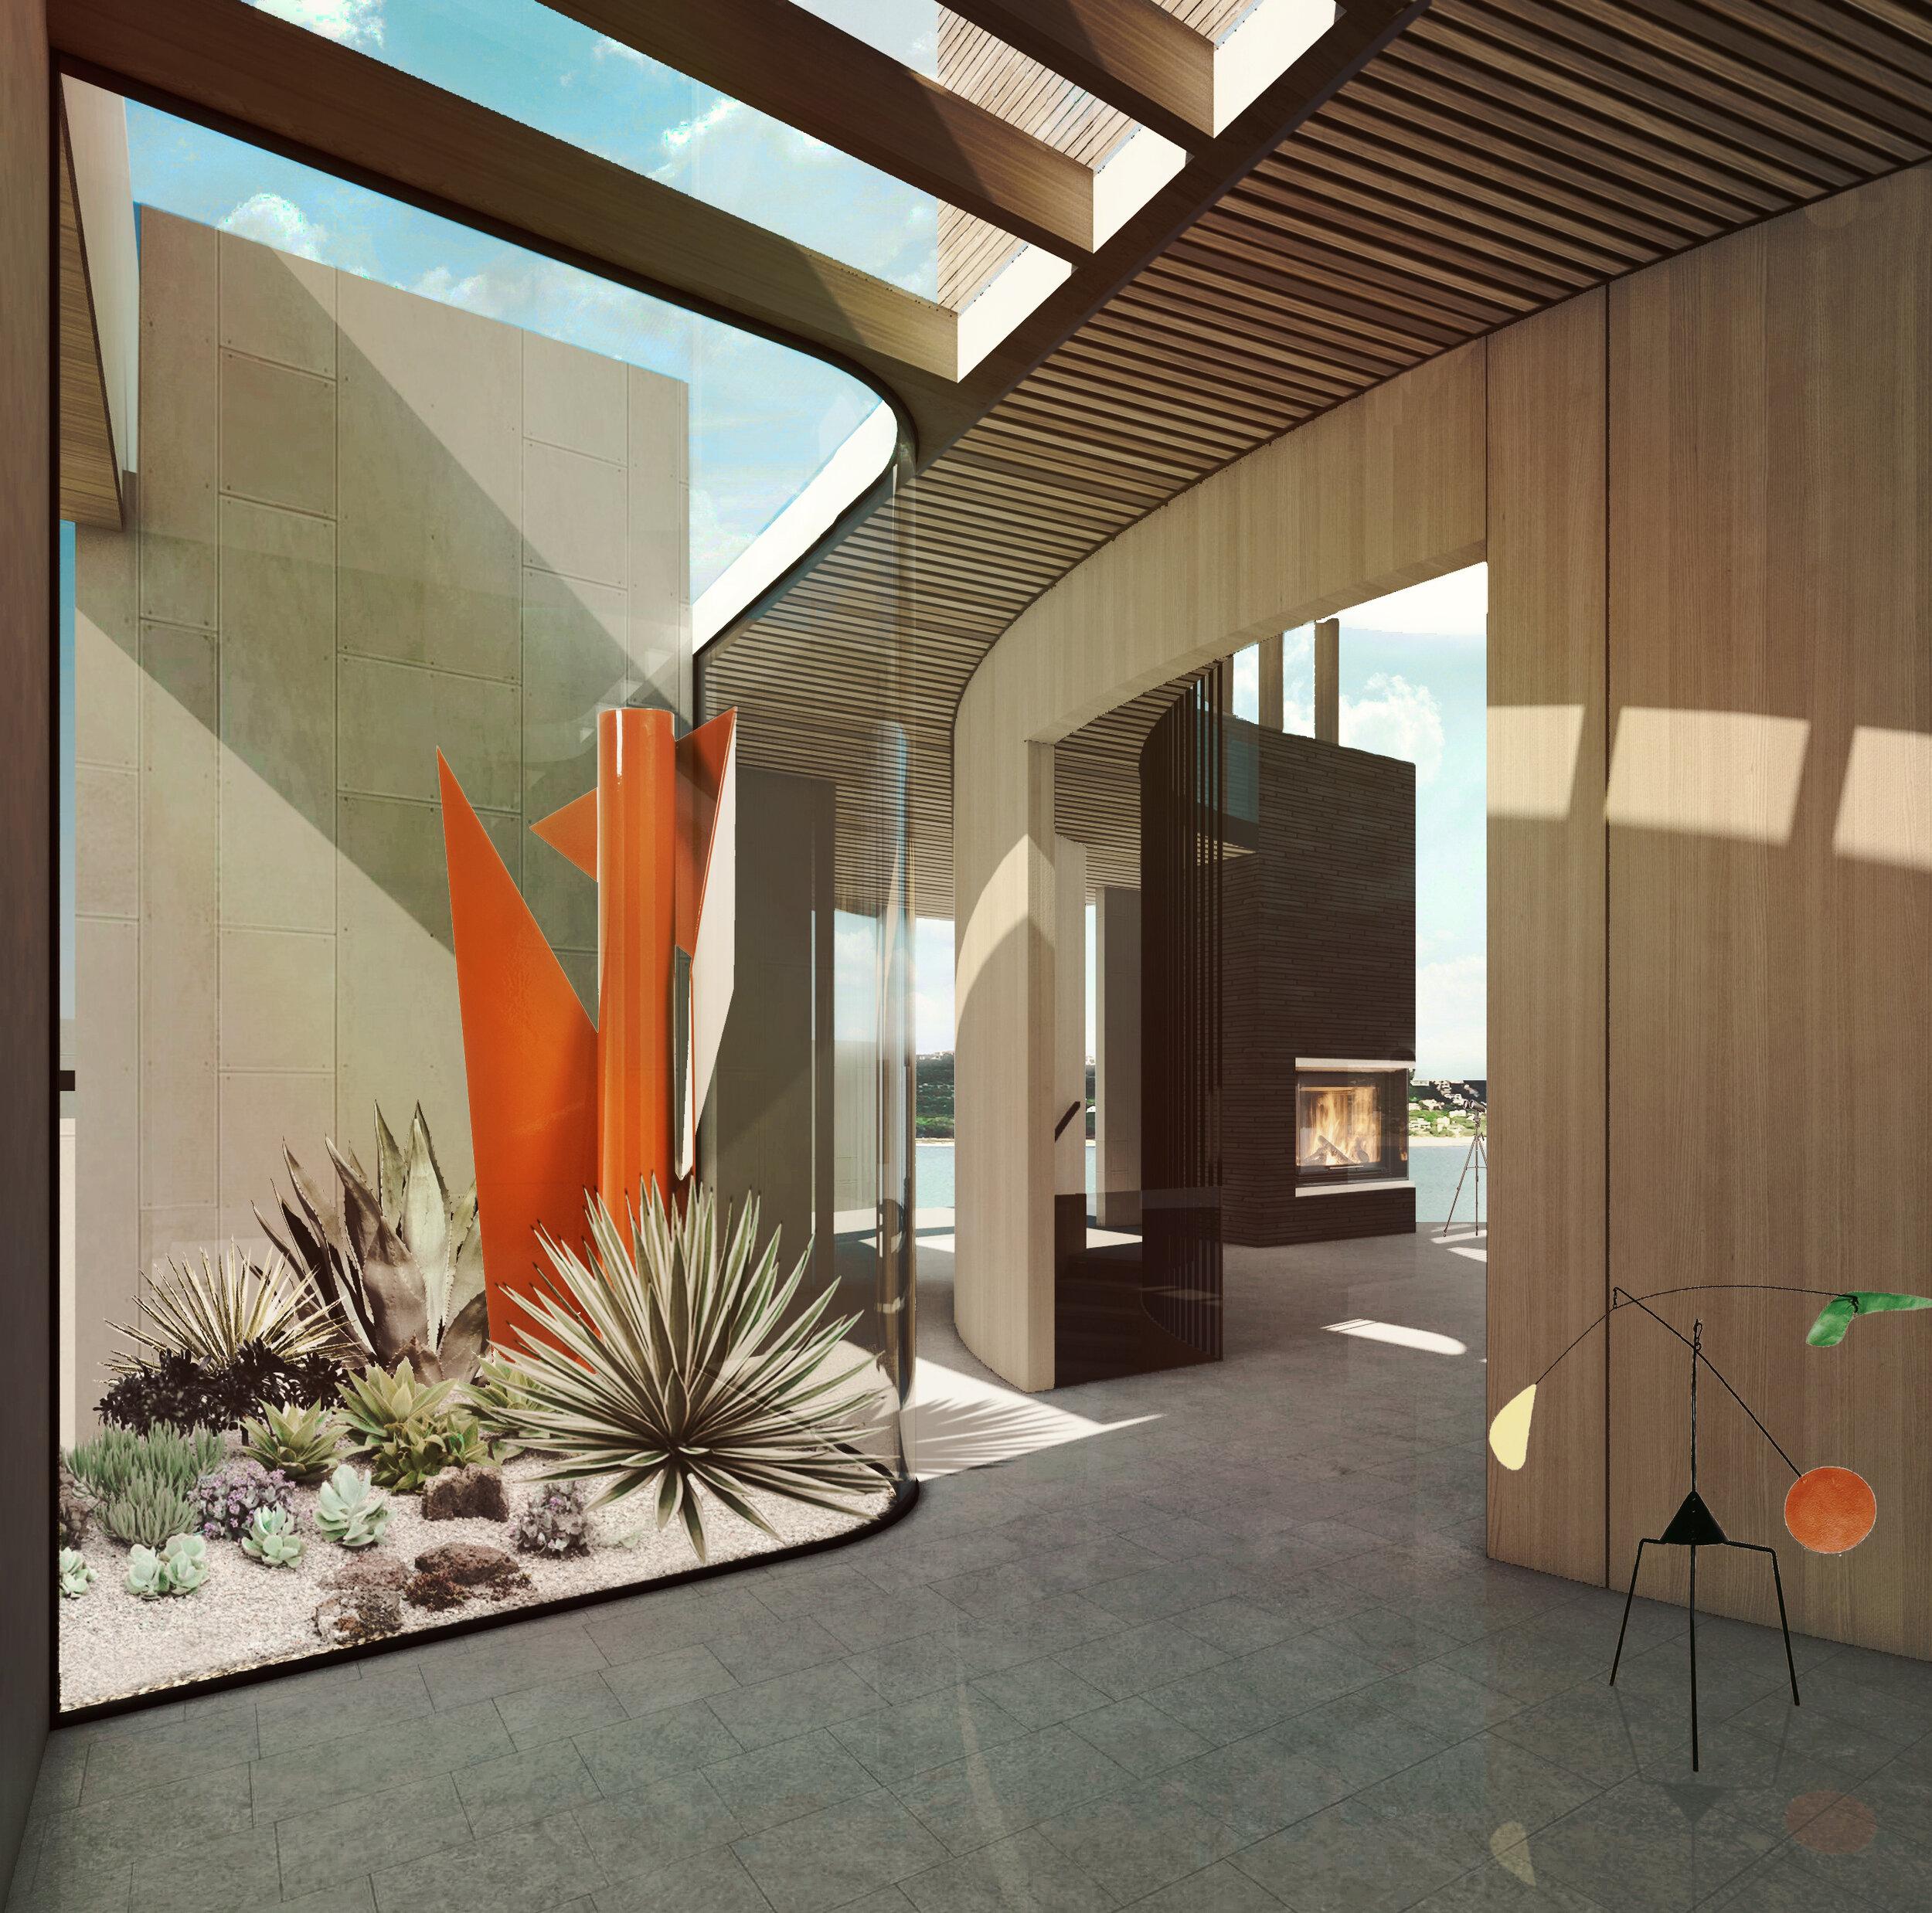 Octant House by Matt Fajkus Architecture. Rendering 6.jpg